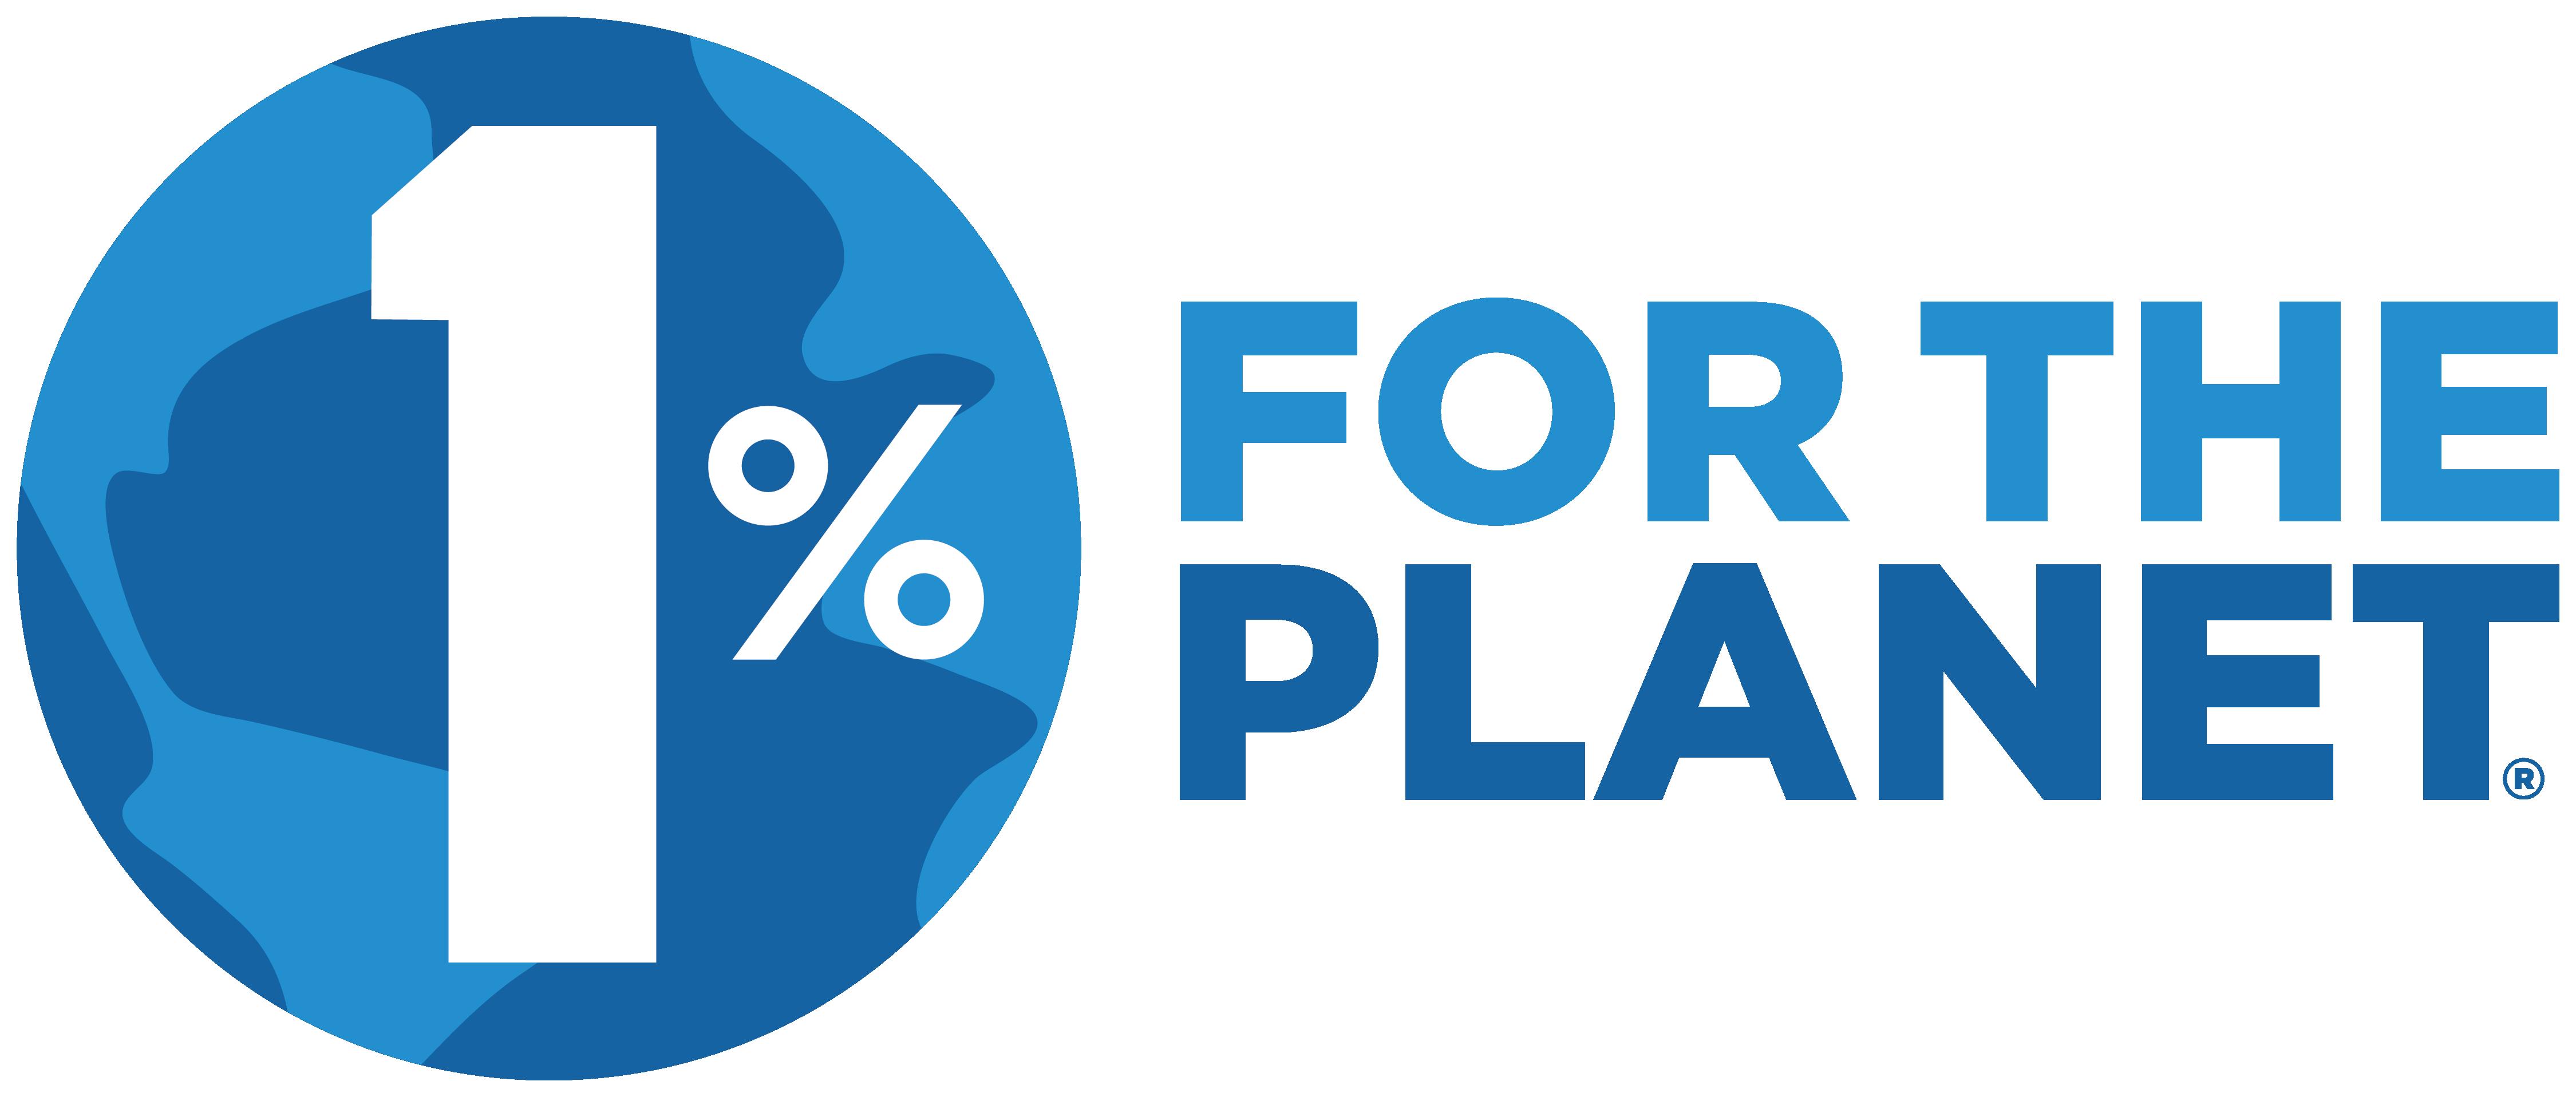 www.onepercentfortheplanet.org